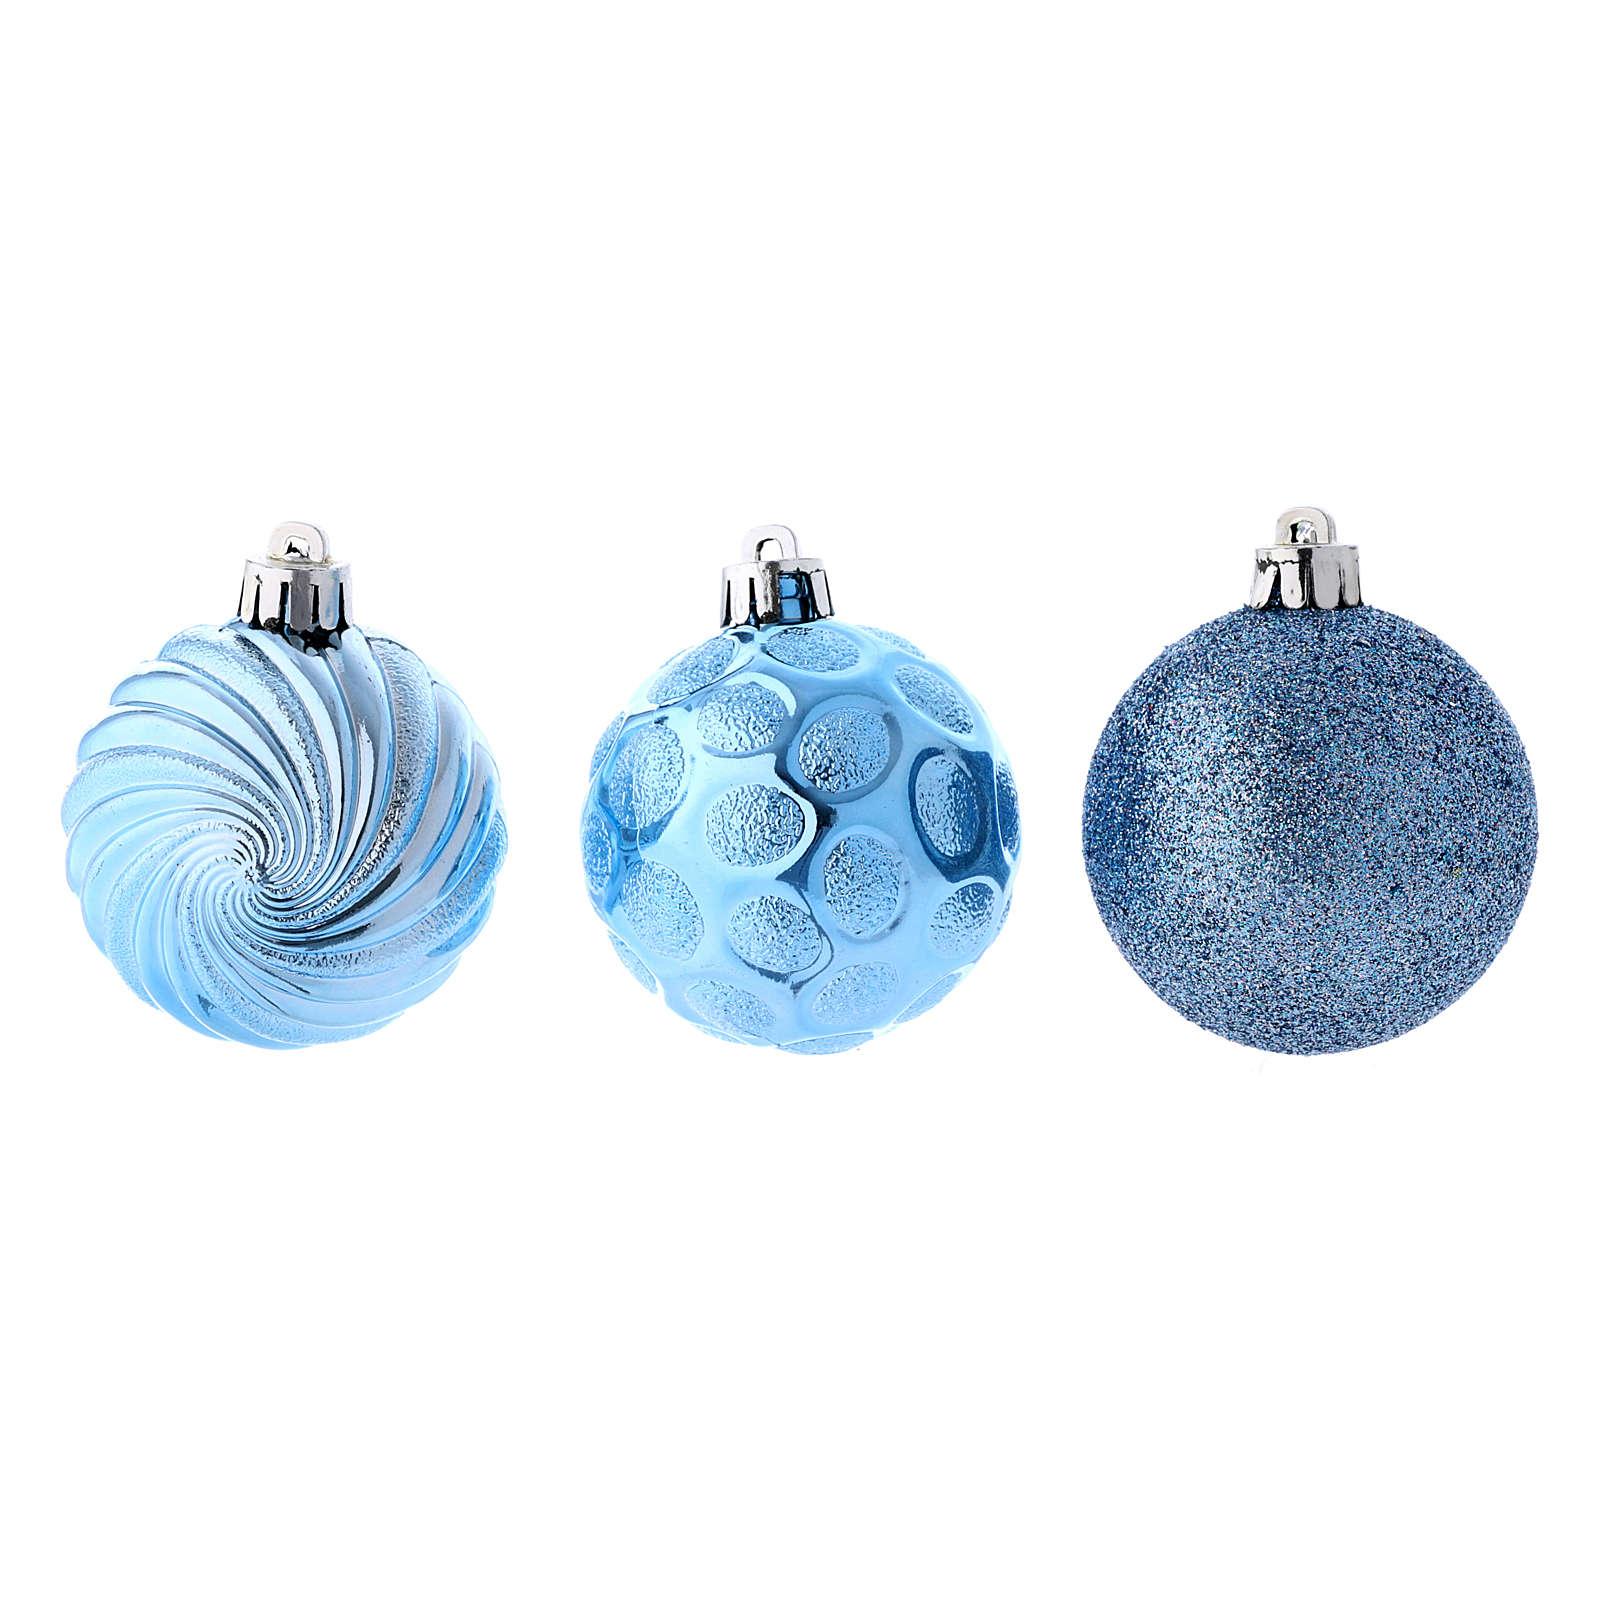 Bola árvore Natal azul 12 peças 60 mm 4